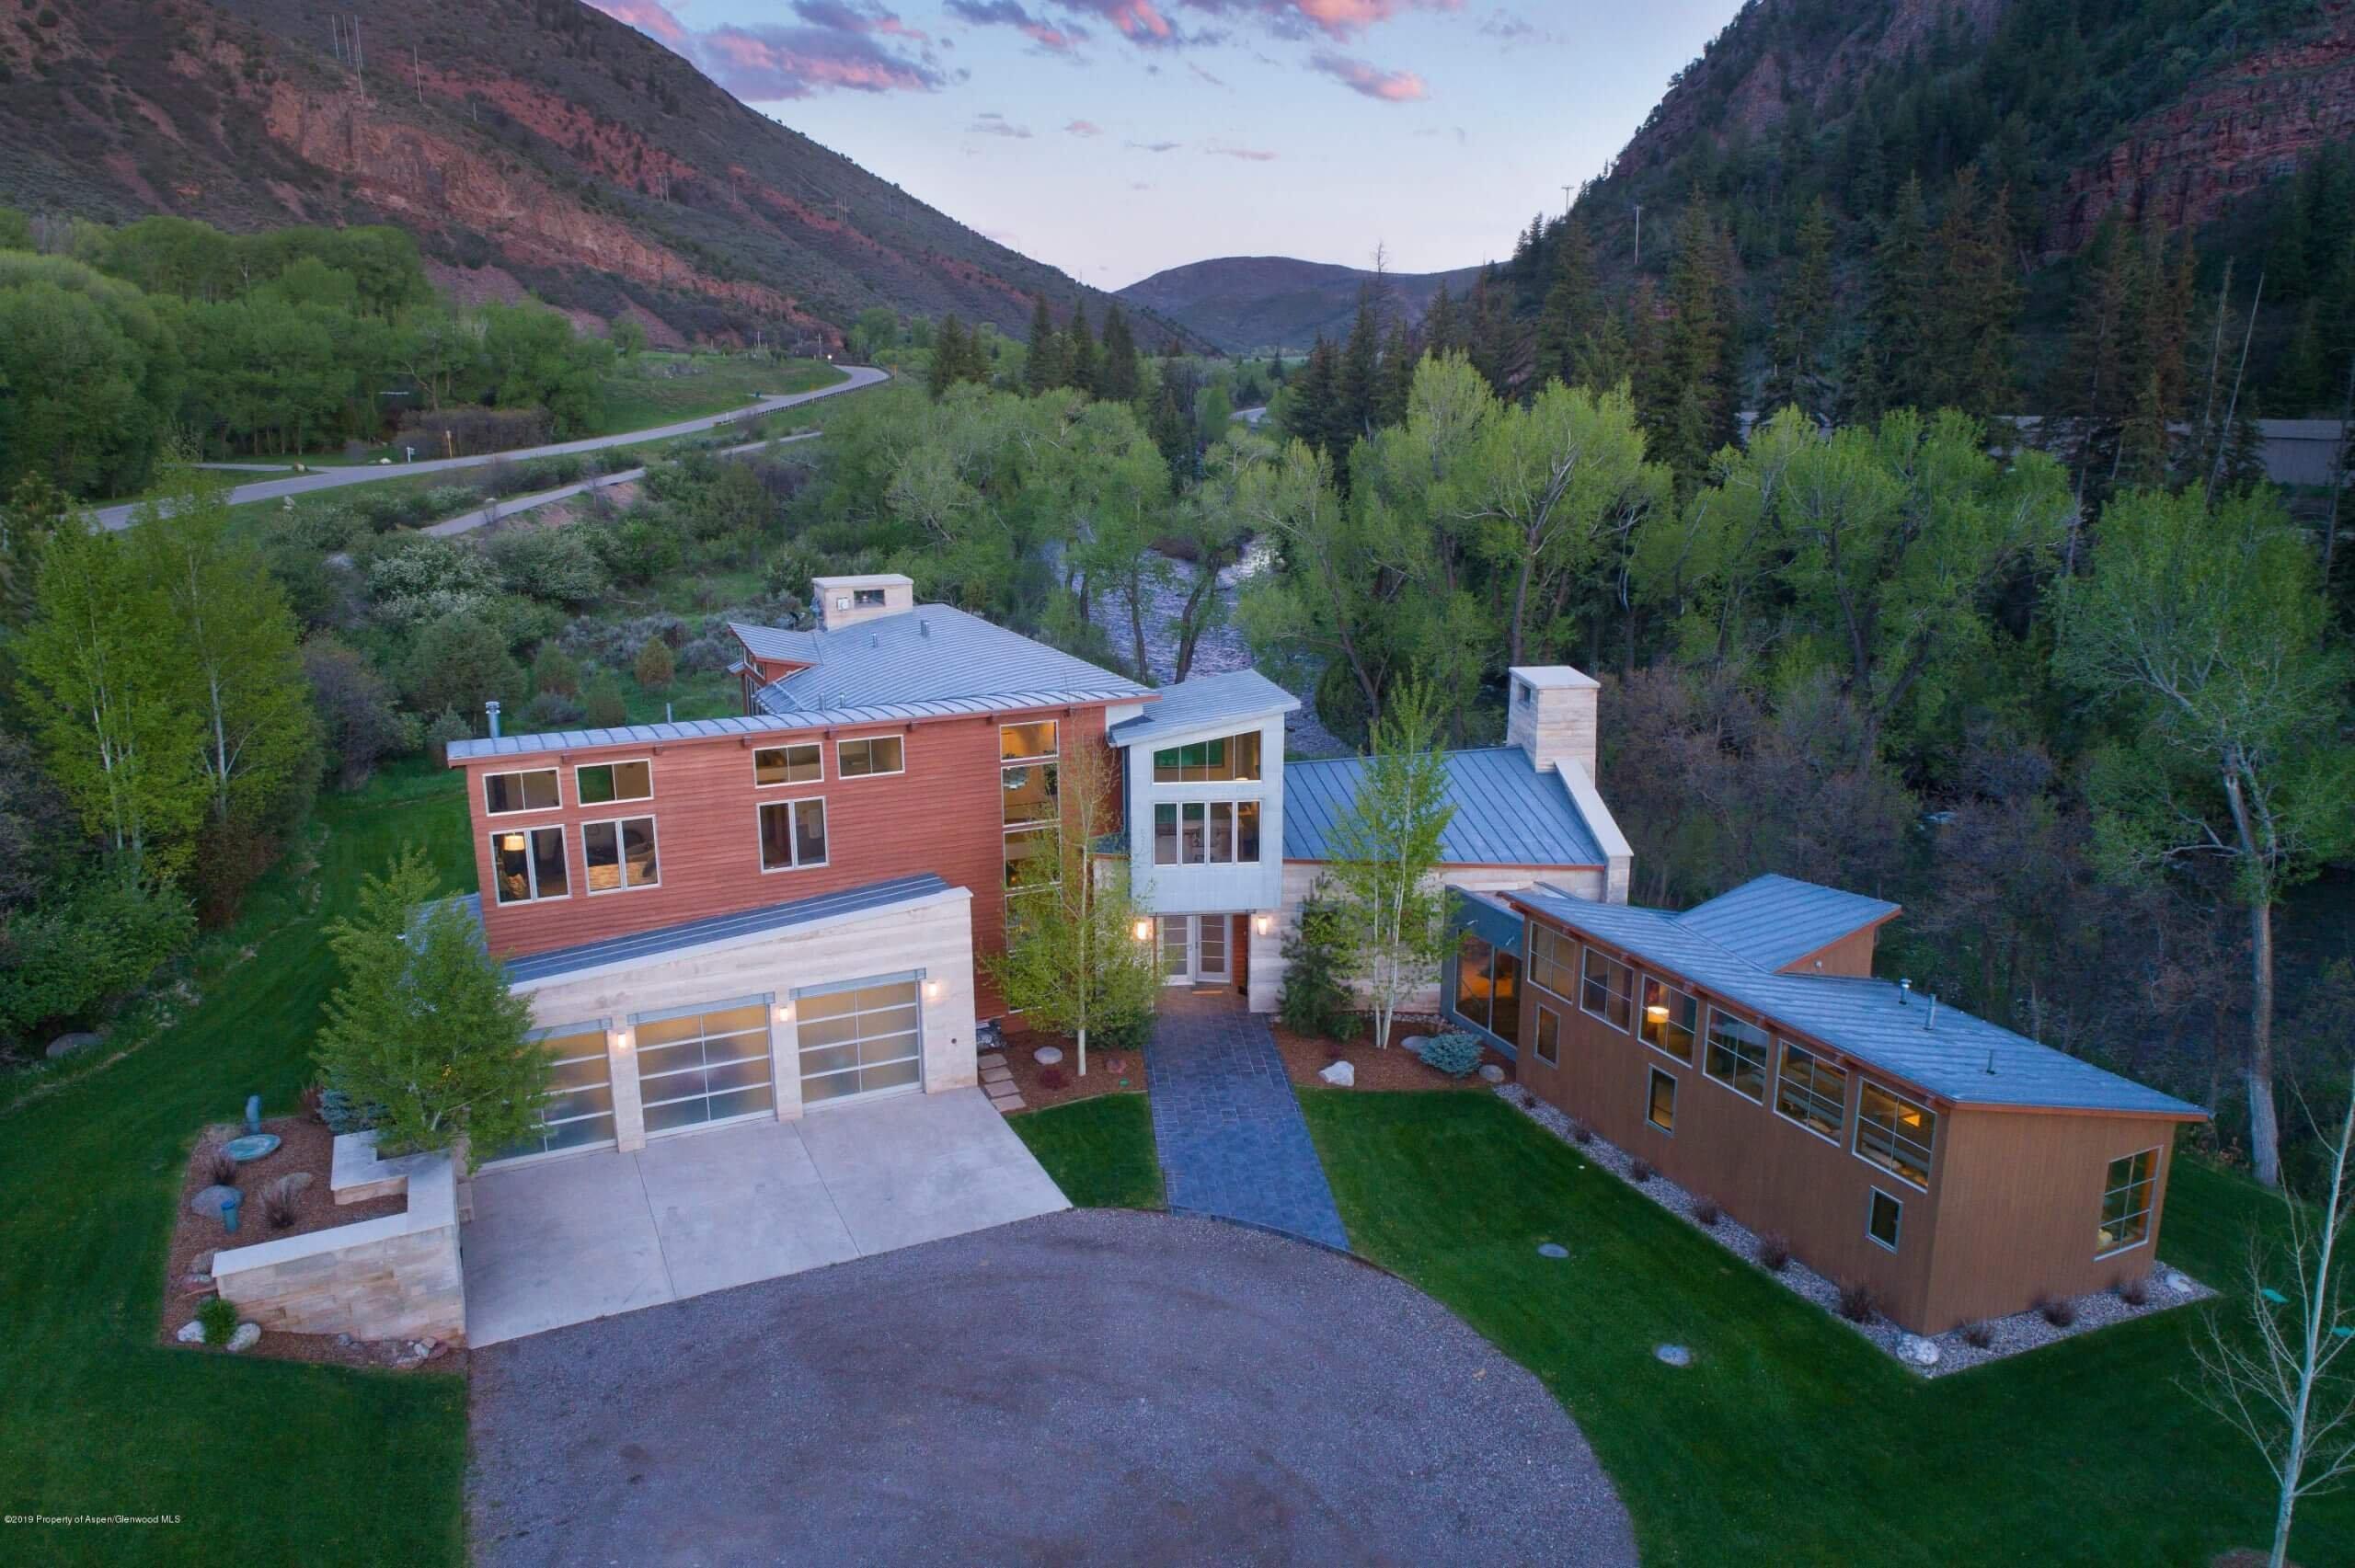 Snowmass Canyon Contemporary Home Along Hwy 82 River Corridor Closes at $4.825M/$941 SF Unfurn. Image